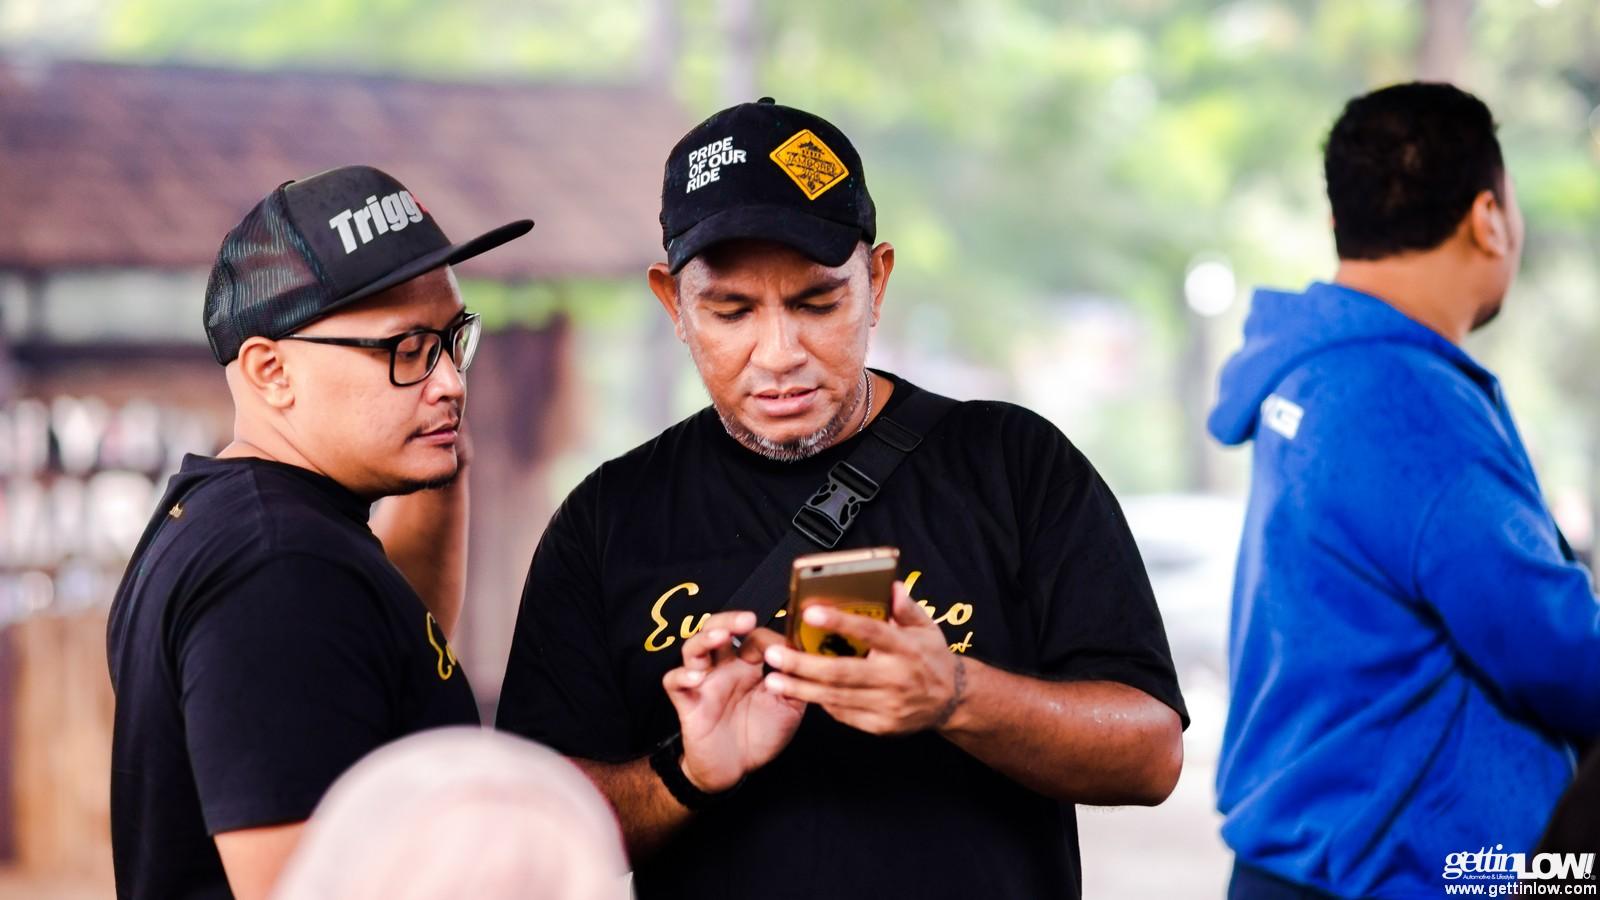 EuroRetroIndonesia Morning Run 2017